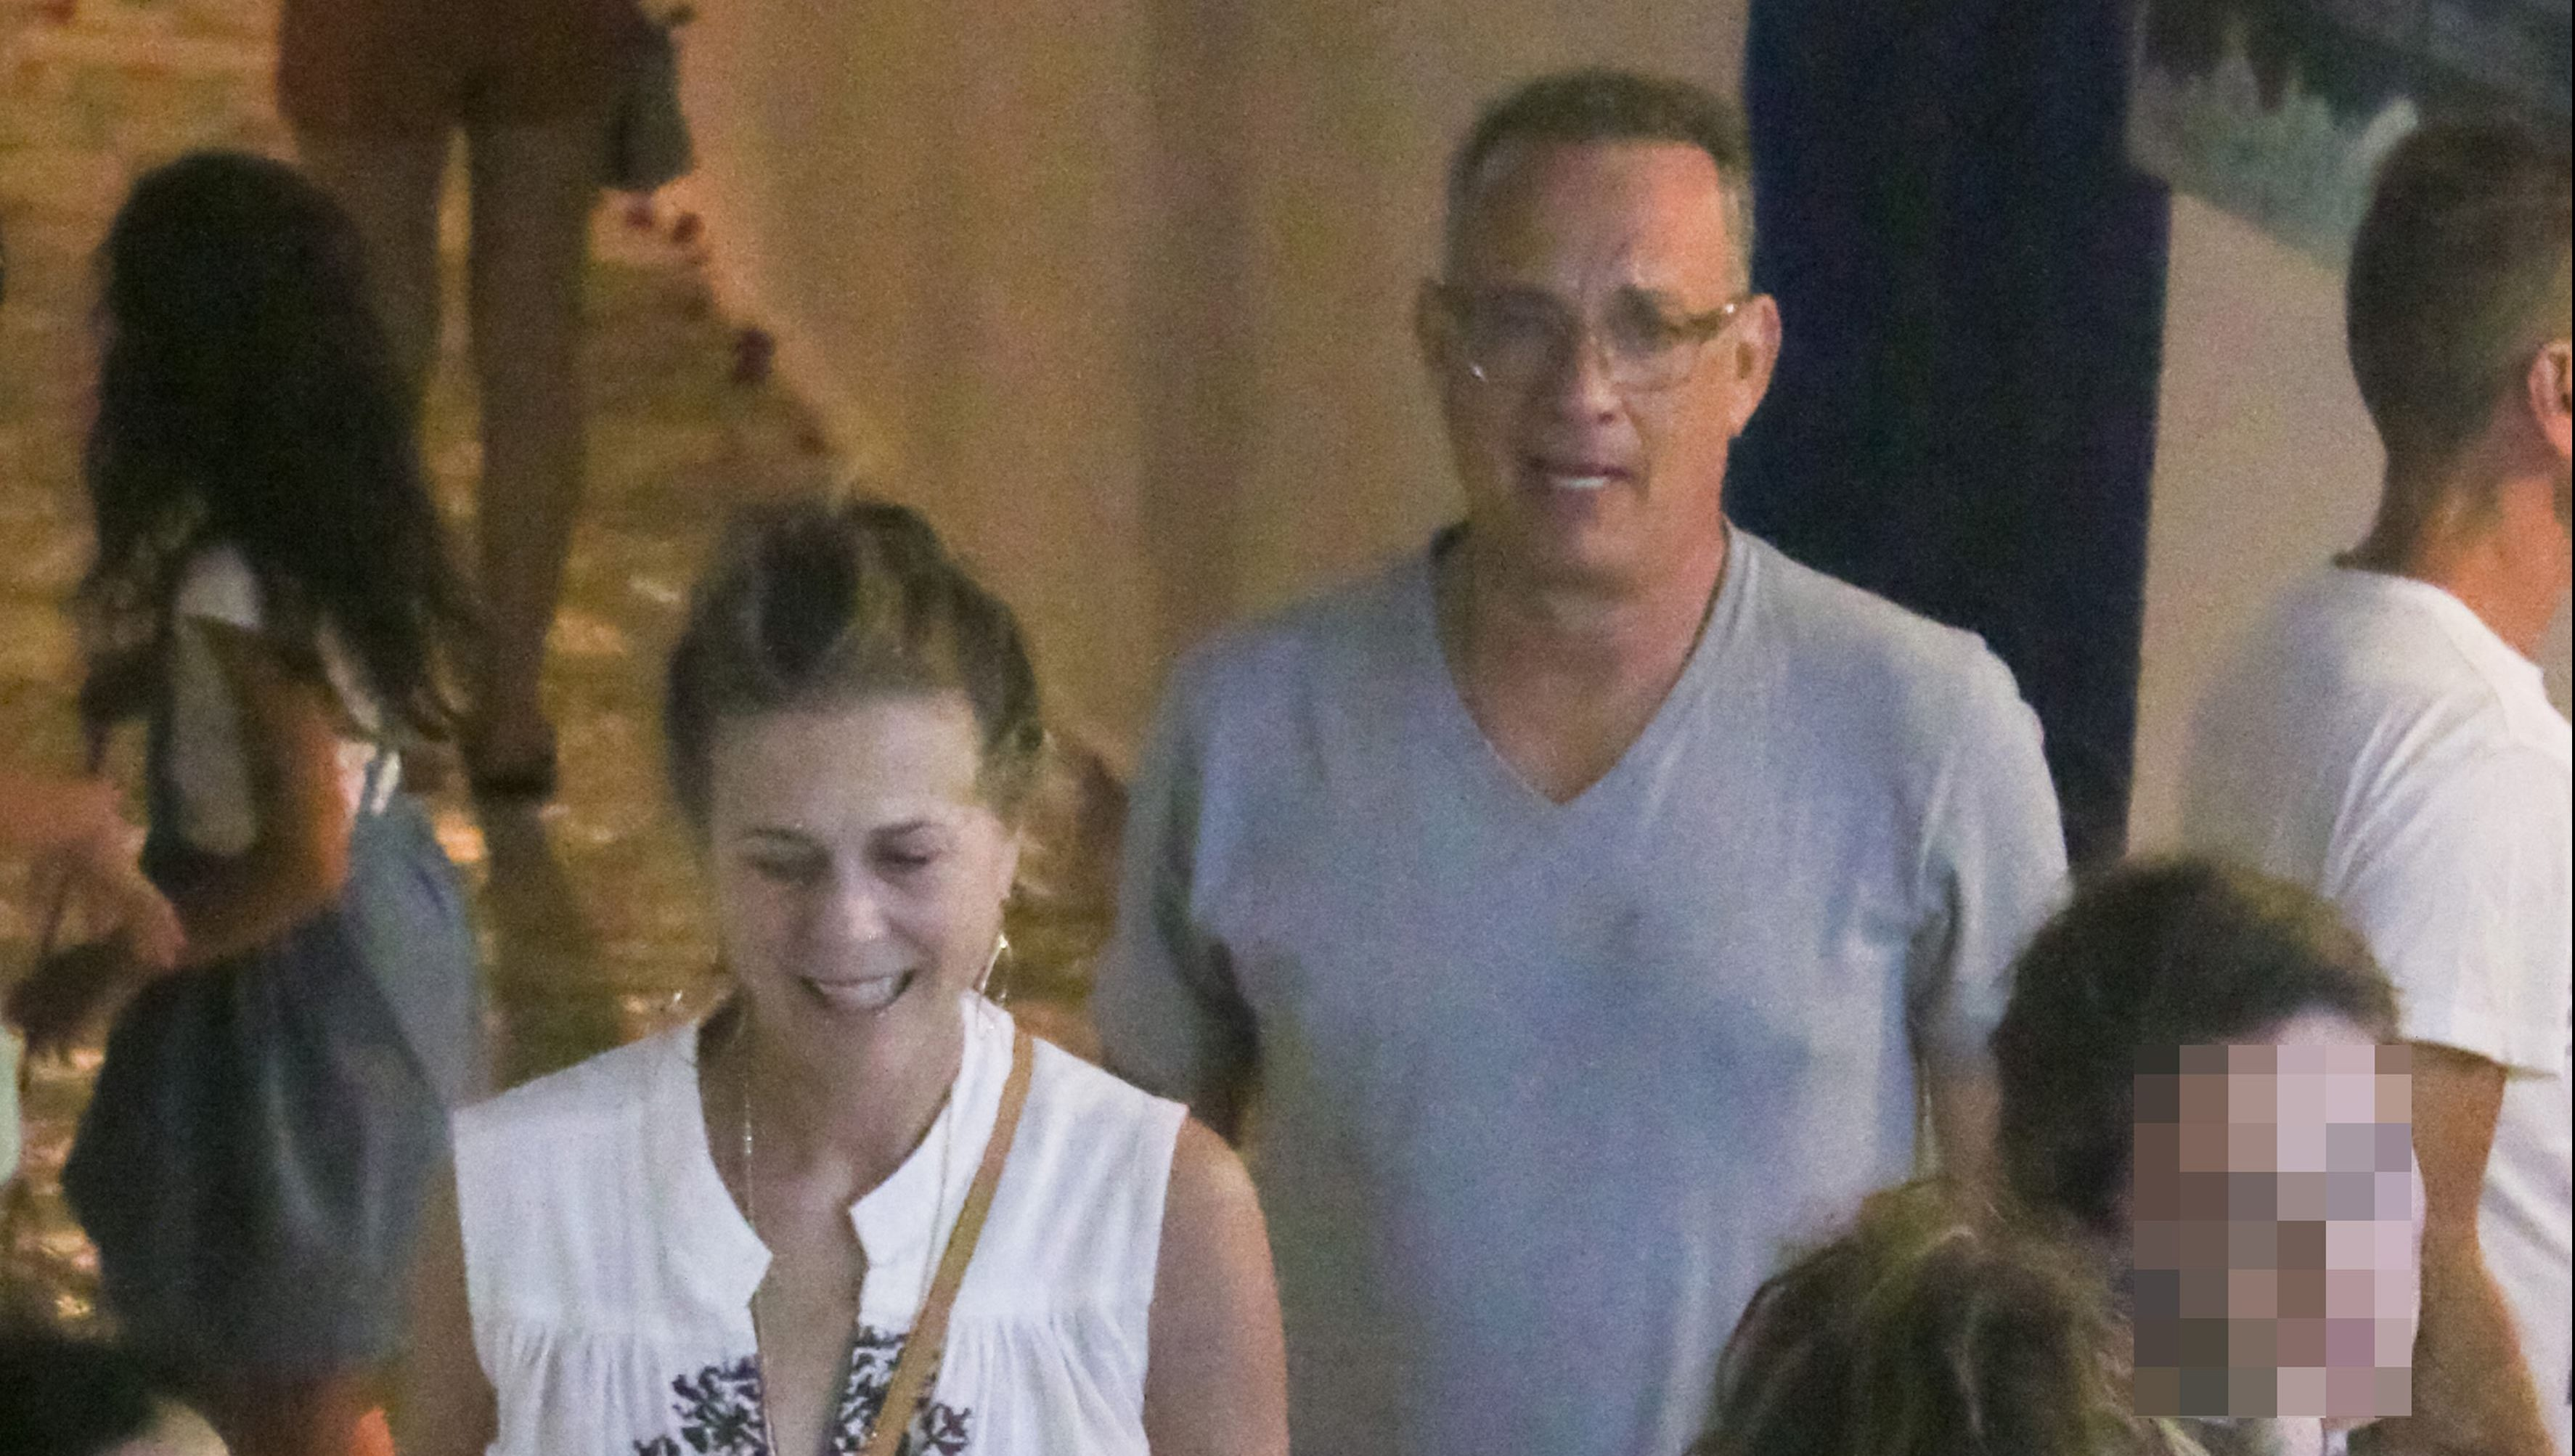 Tom Hanks And Rita Wilson Are Having A Blast On Vacation